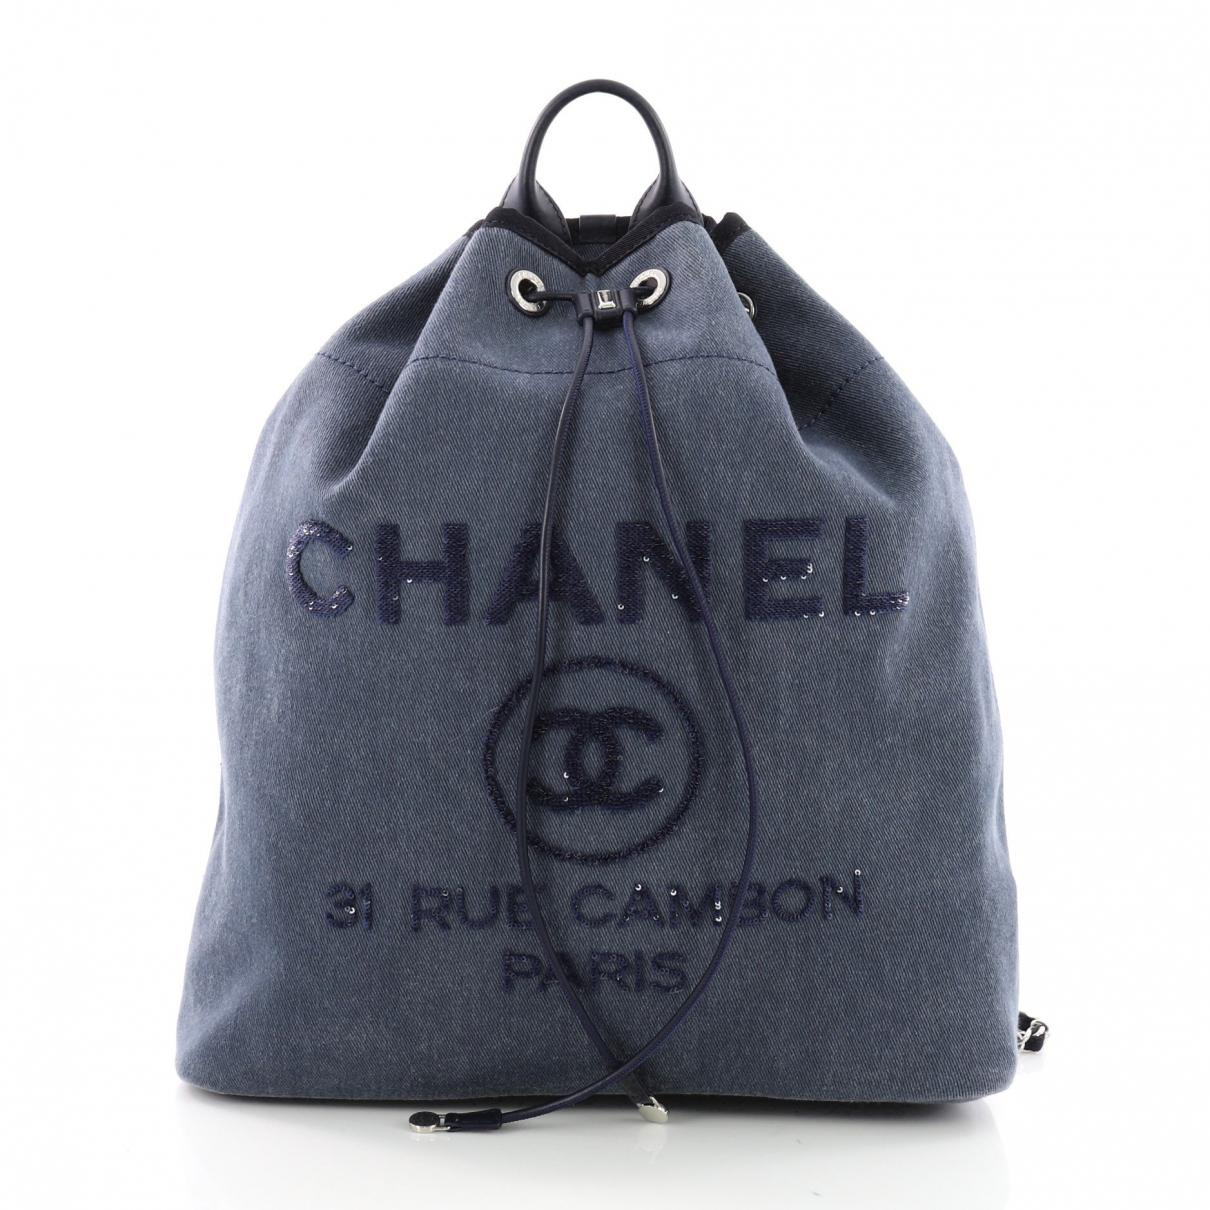 Harga Jual Chanel Deauville Terbaru 2018 Autofriend Garnish Pelindung Ai 3232 Honda Hrv H Rv 2014 2015 2016 On Foglamp Cover Lyst Pre Owned Backpack In Blue View Fullscreen